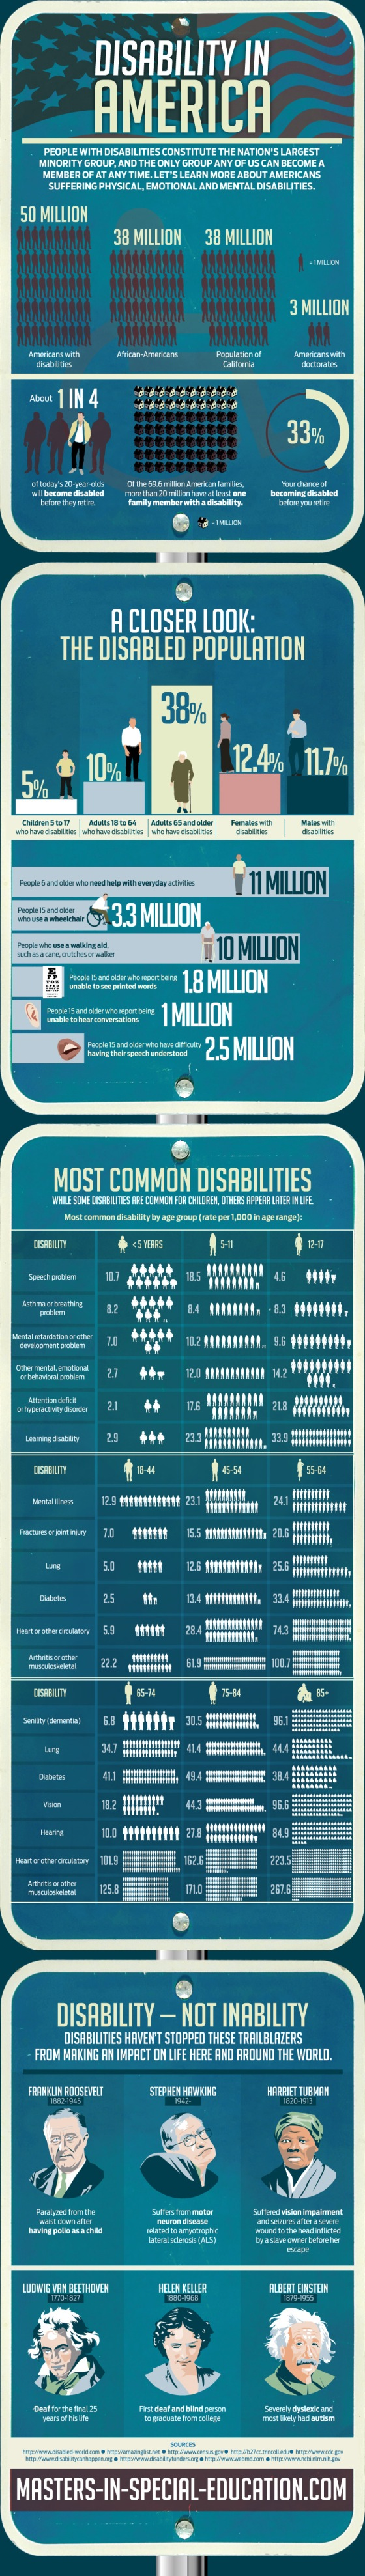 Disability in America